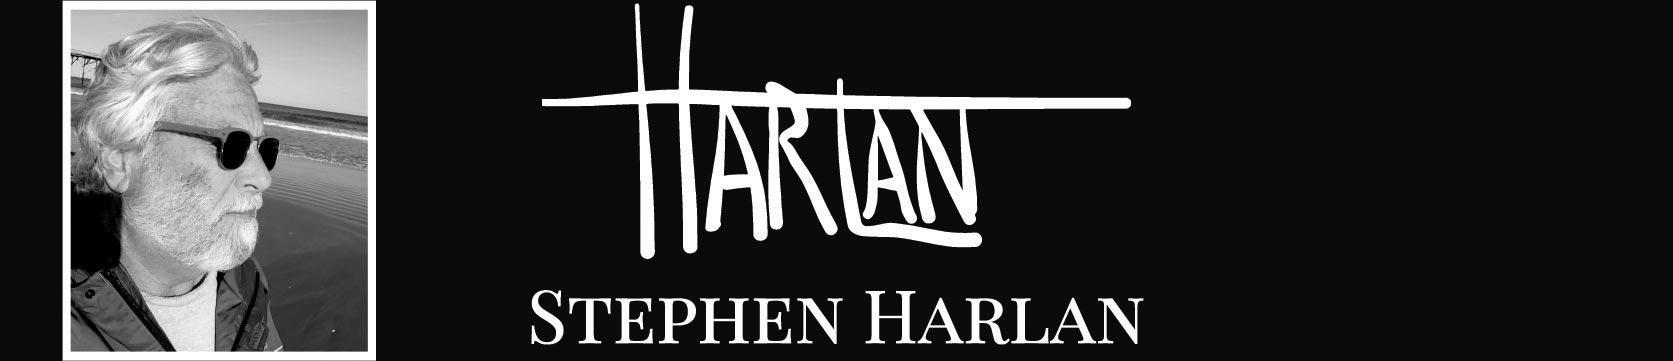 Stephen Harlan Artist